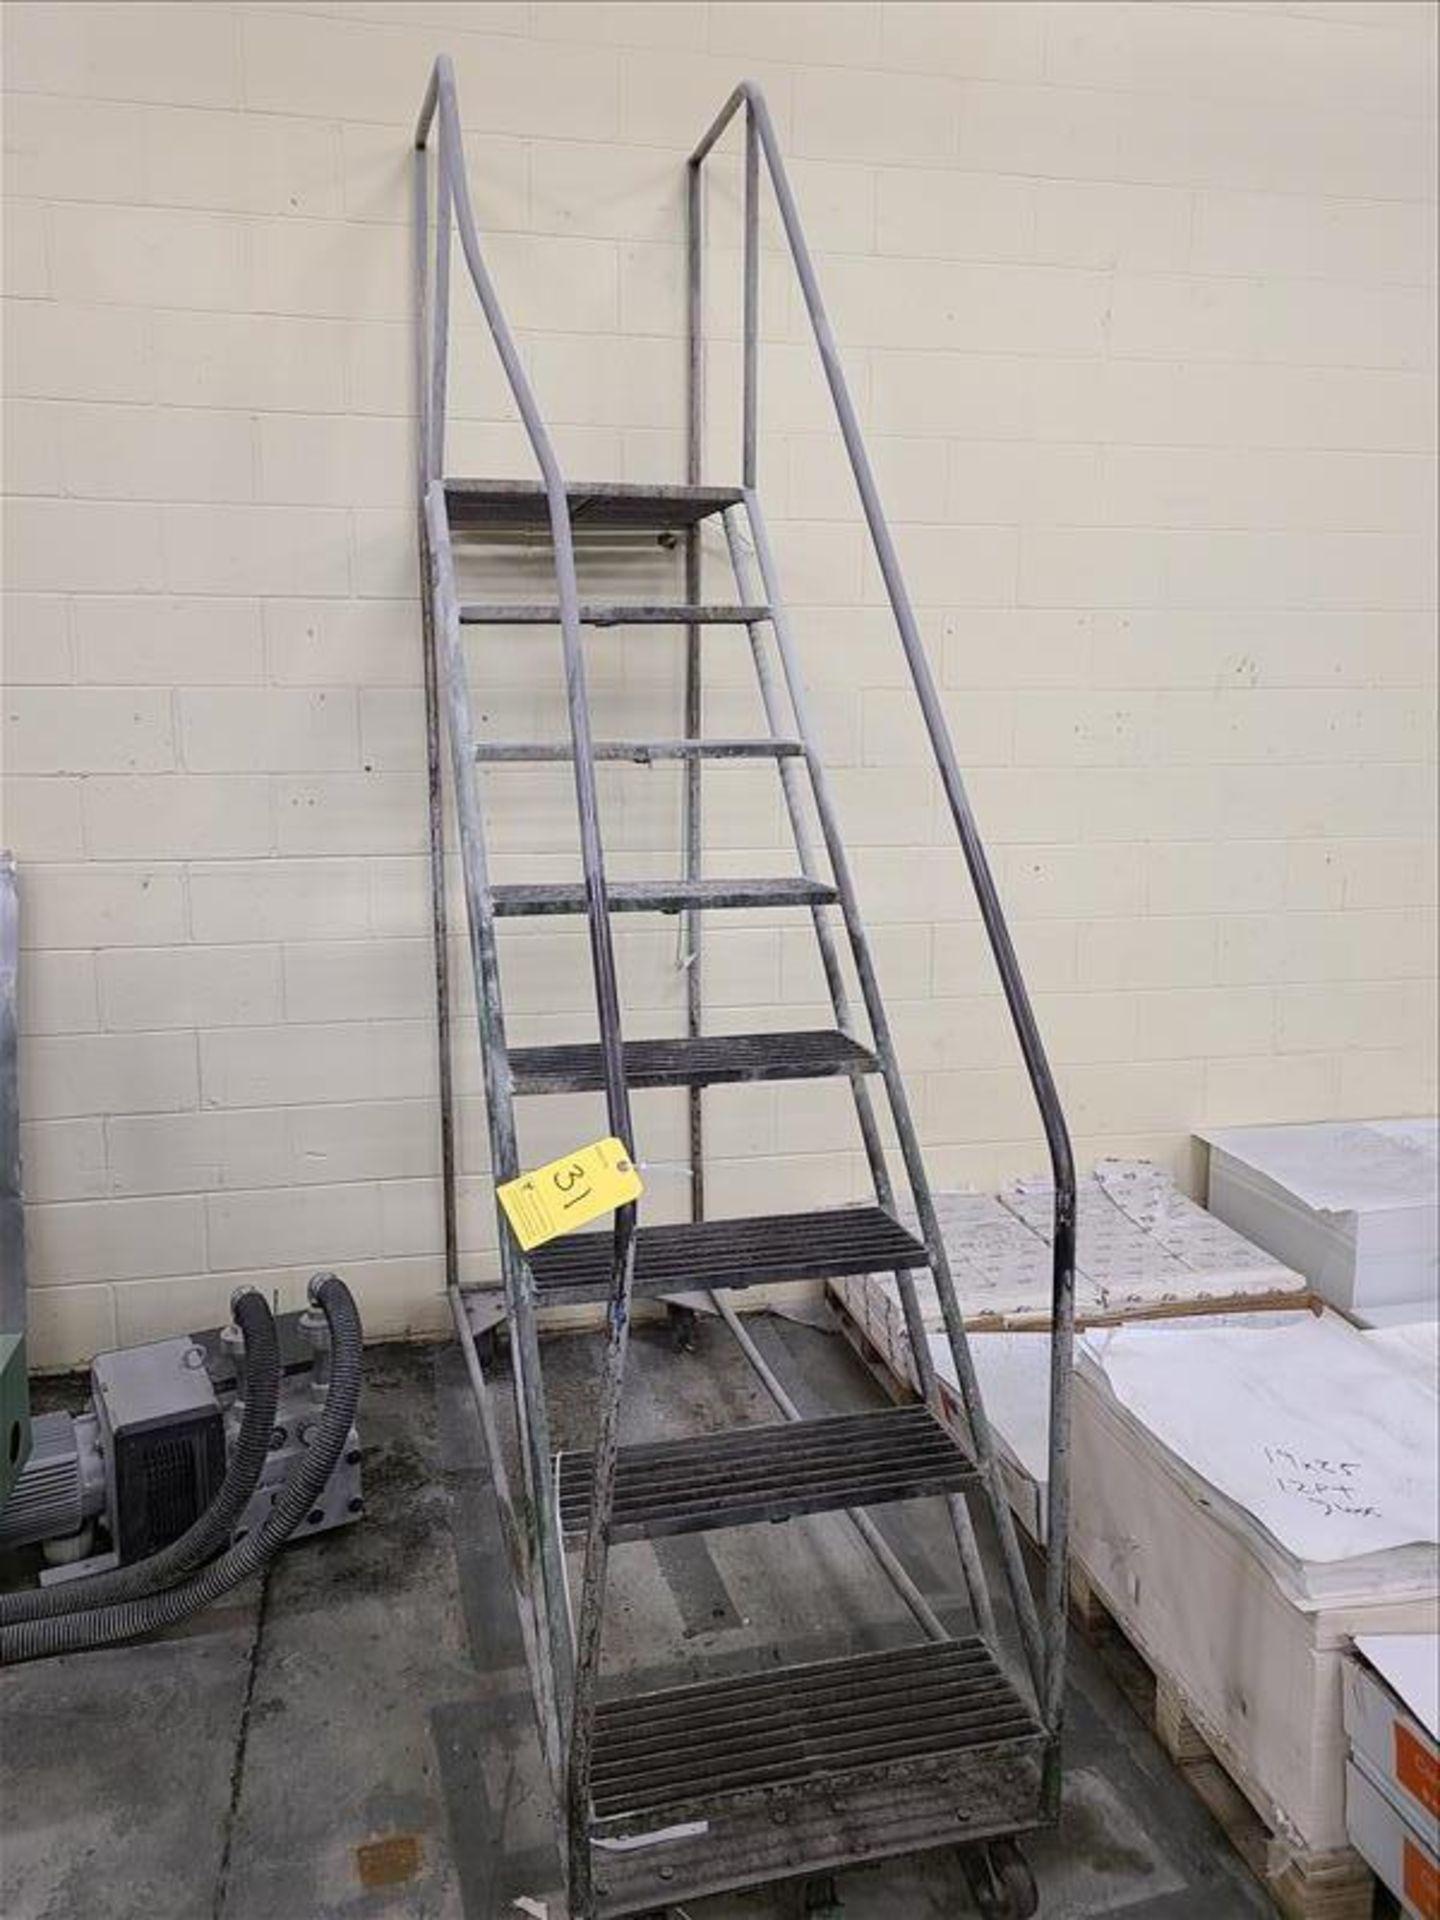 8-Step Warehouse ladder